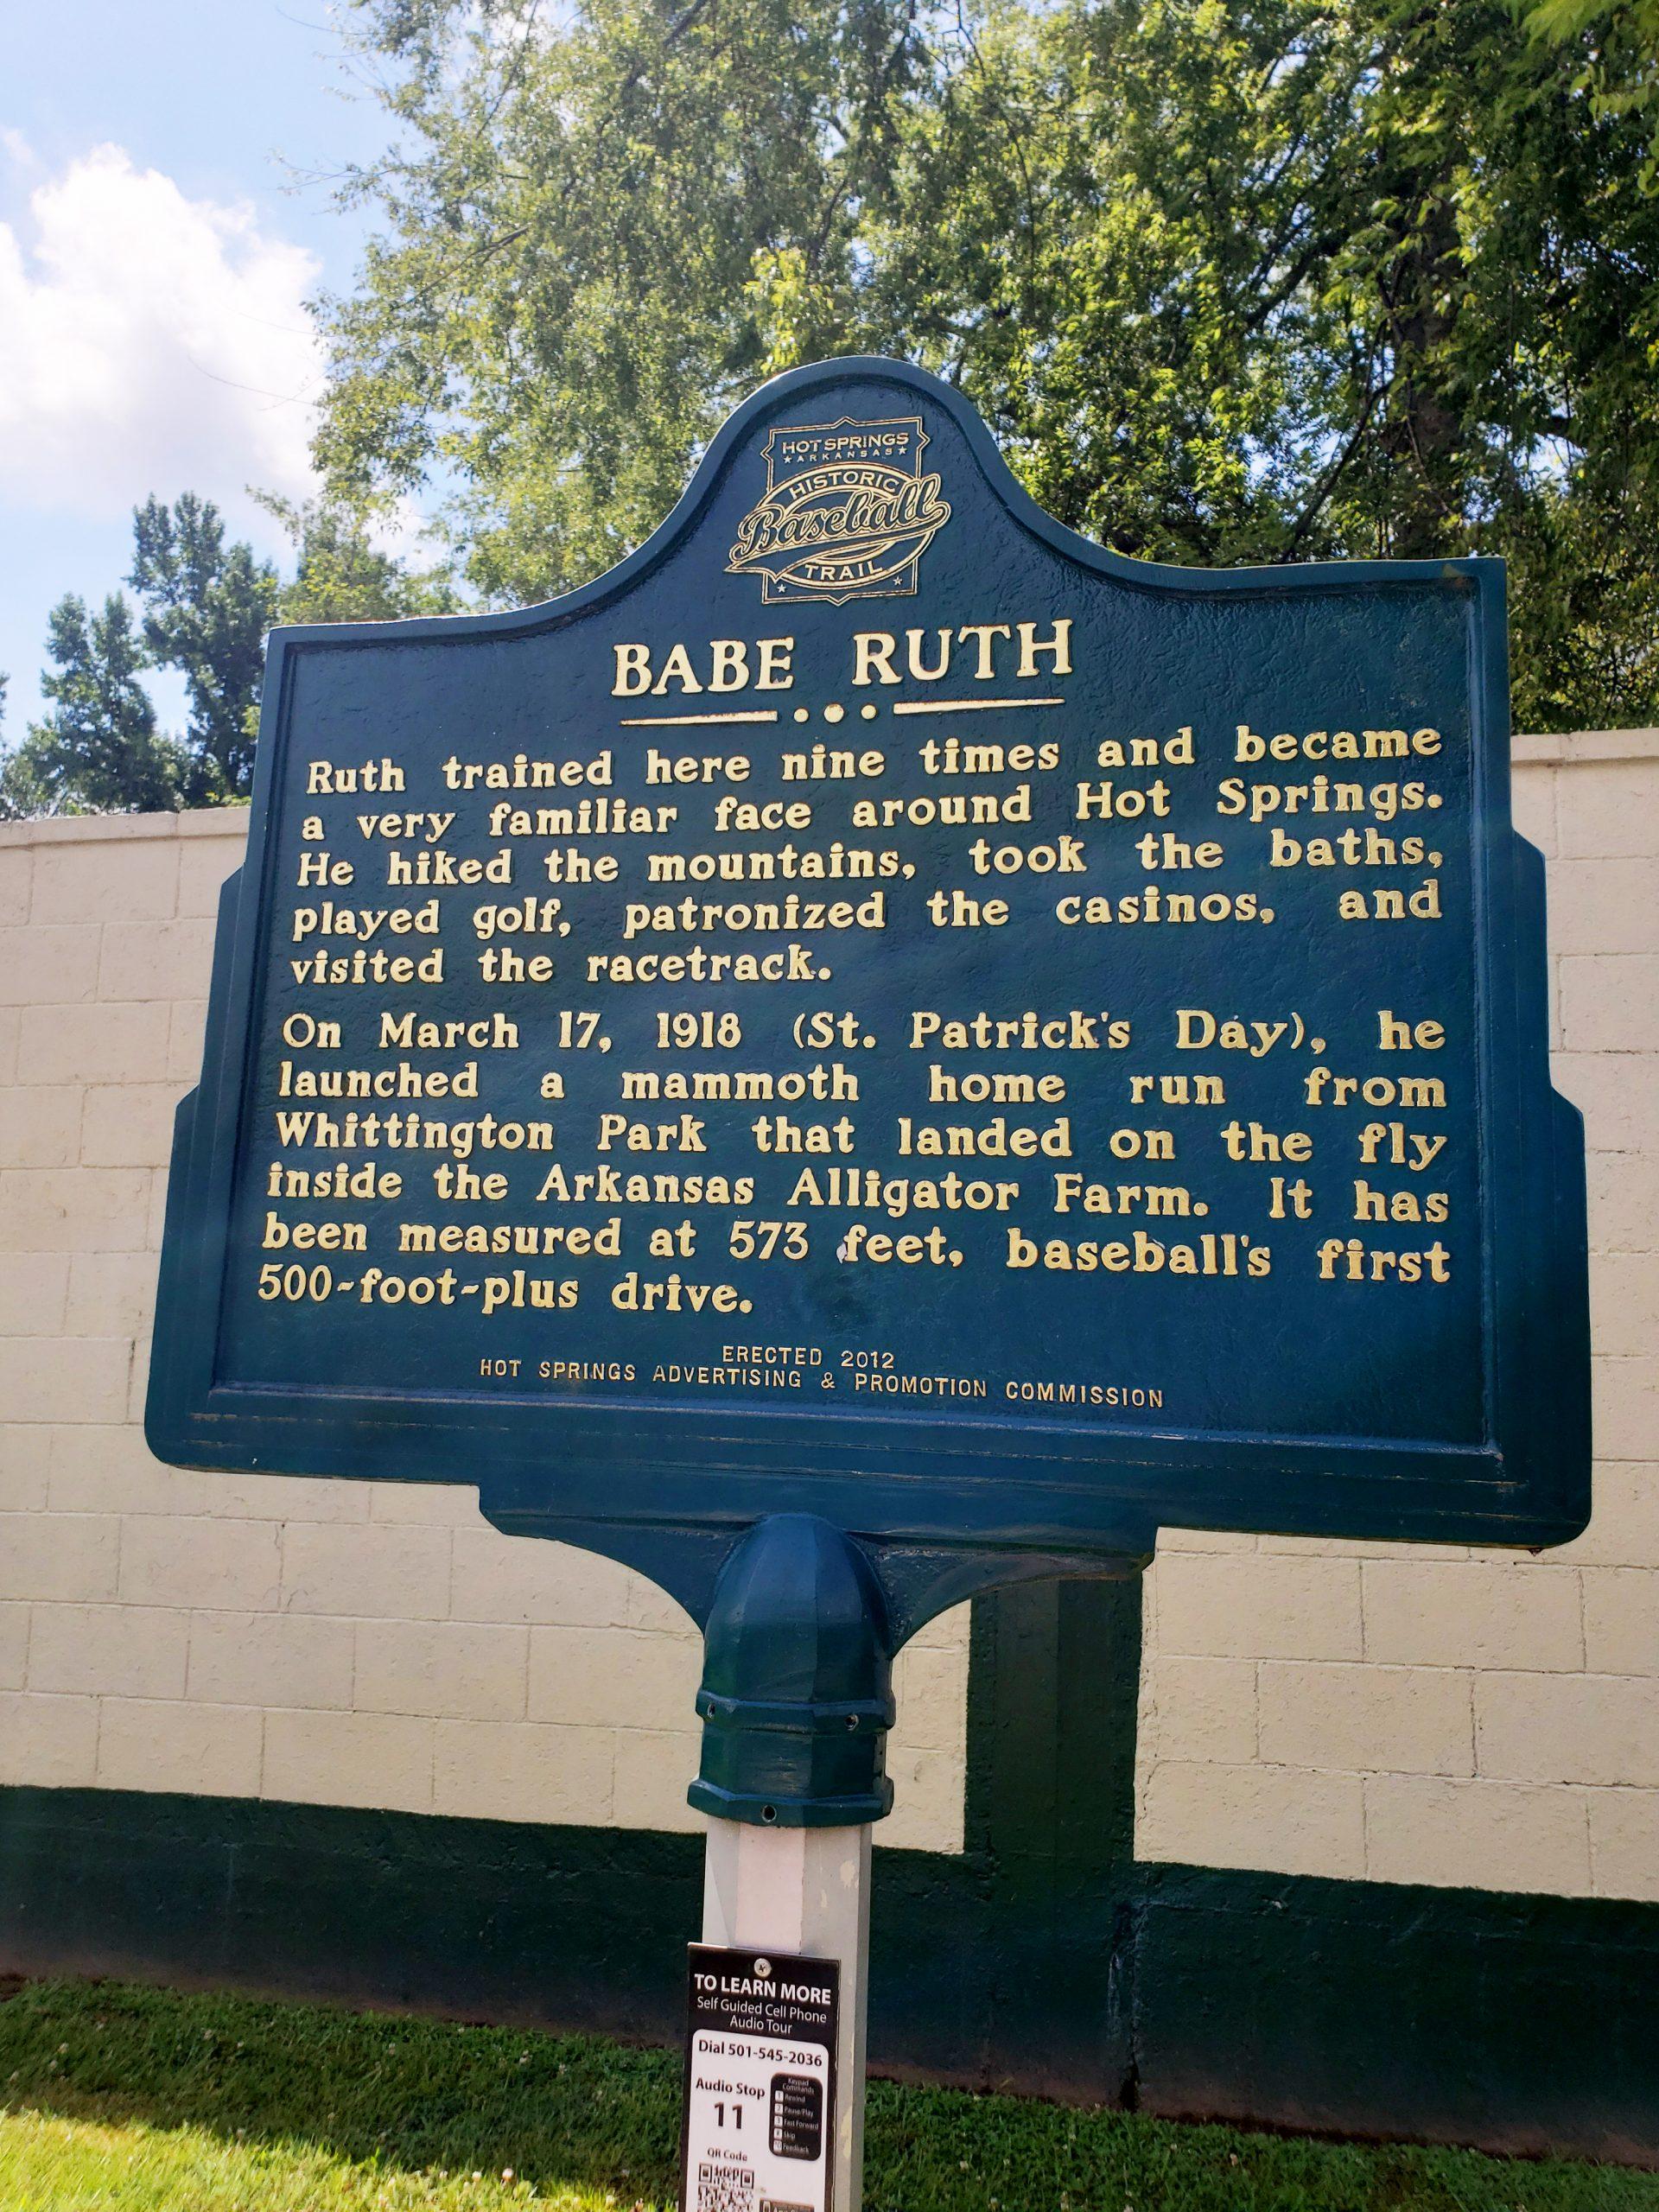 Babe Ruth Marker, Hot Springs, Arkansas (Photo Credit: Violet Sky)